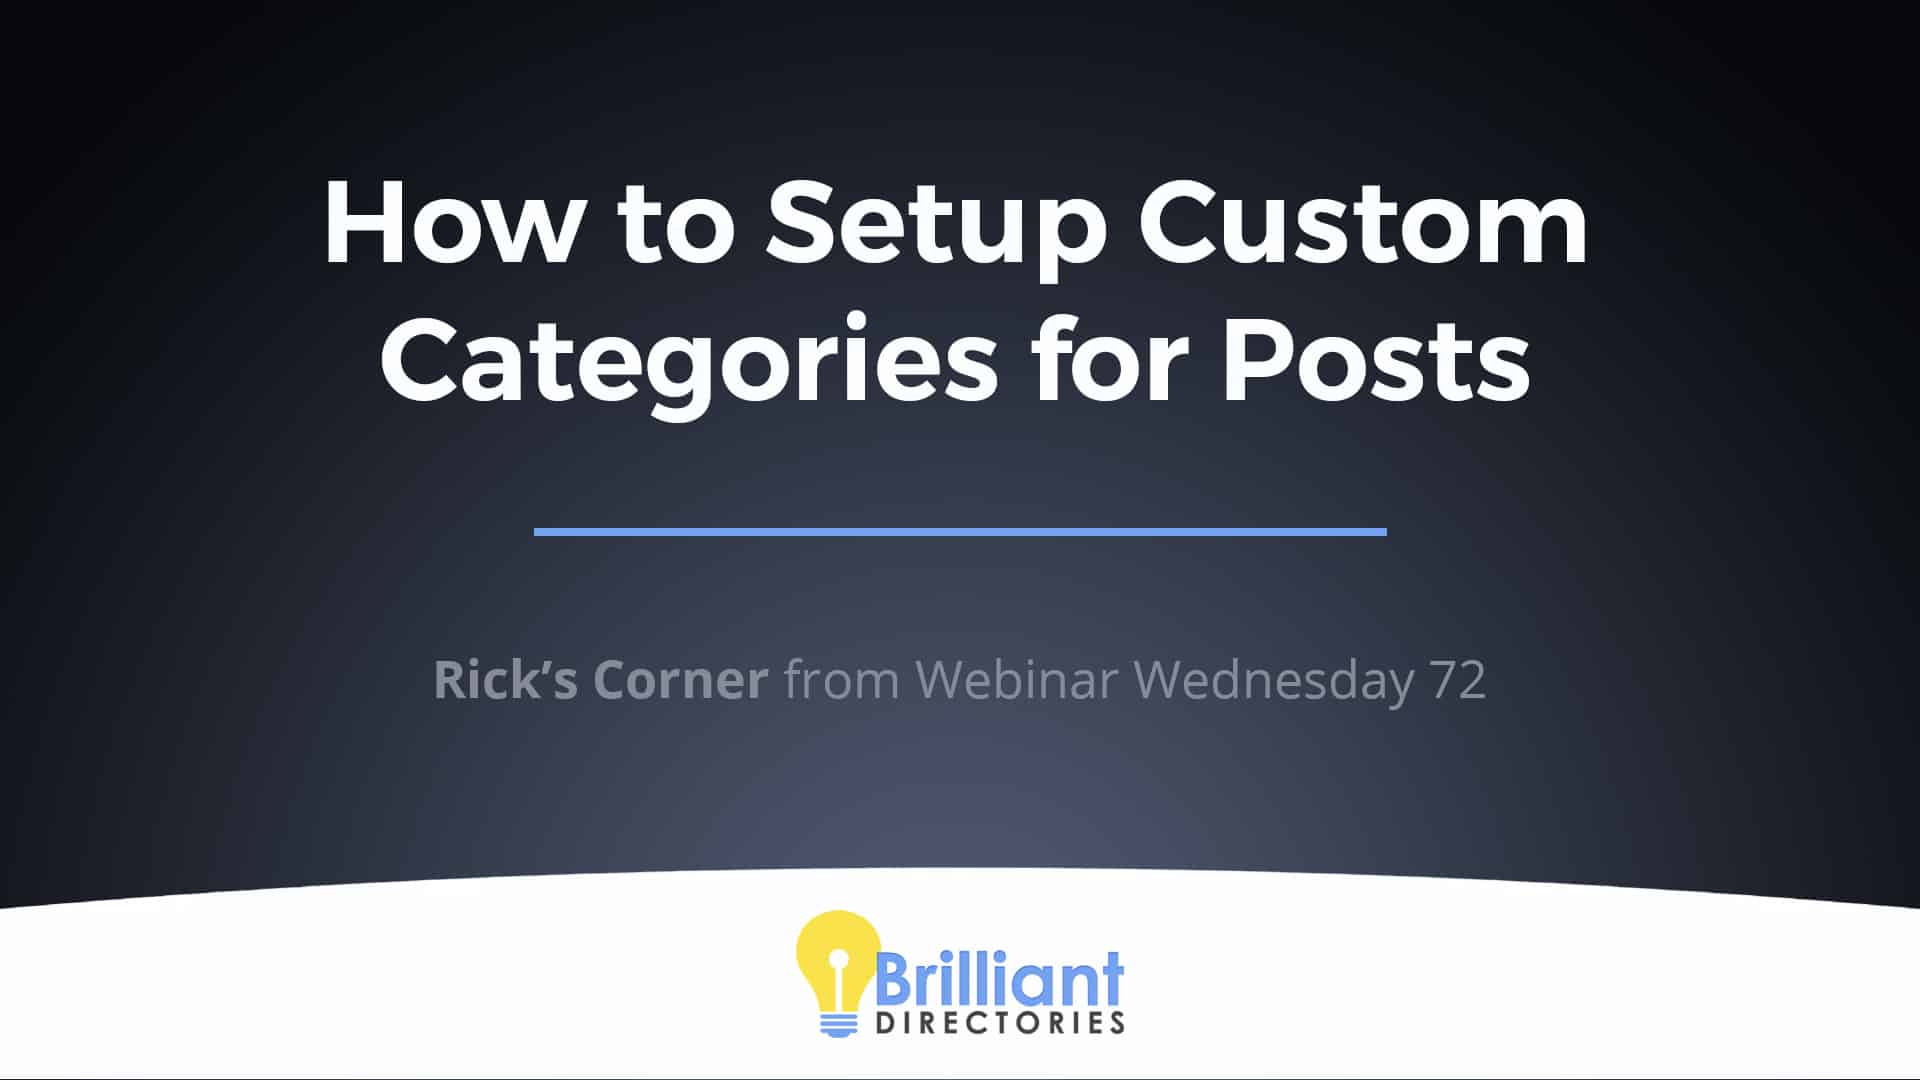 https://www.brilliantdirectories.com/blog/how-to-set-up-custom-categories-for-posts